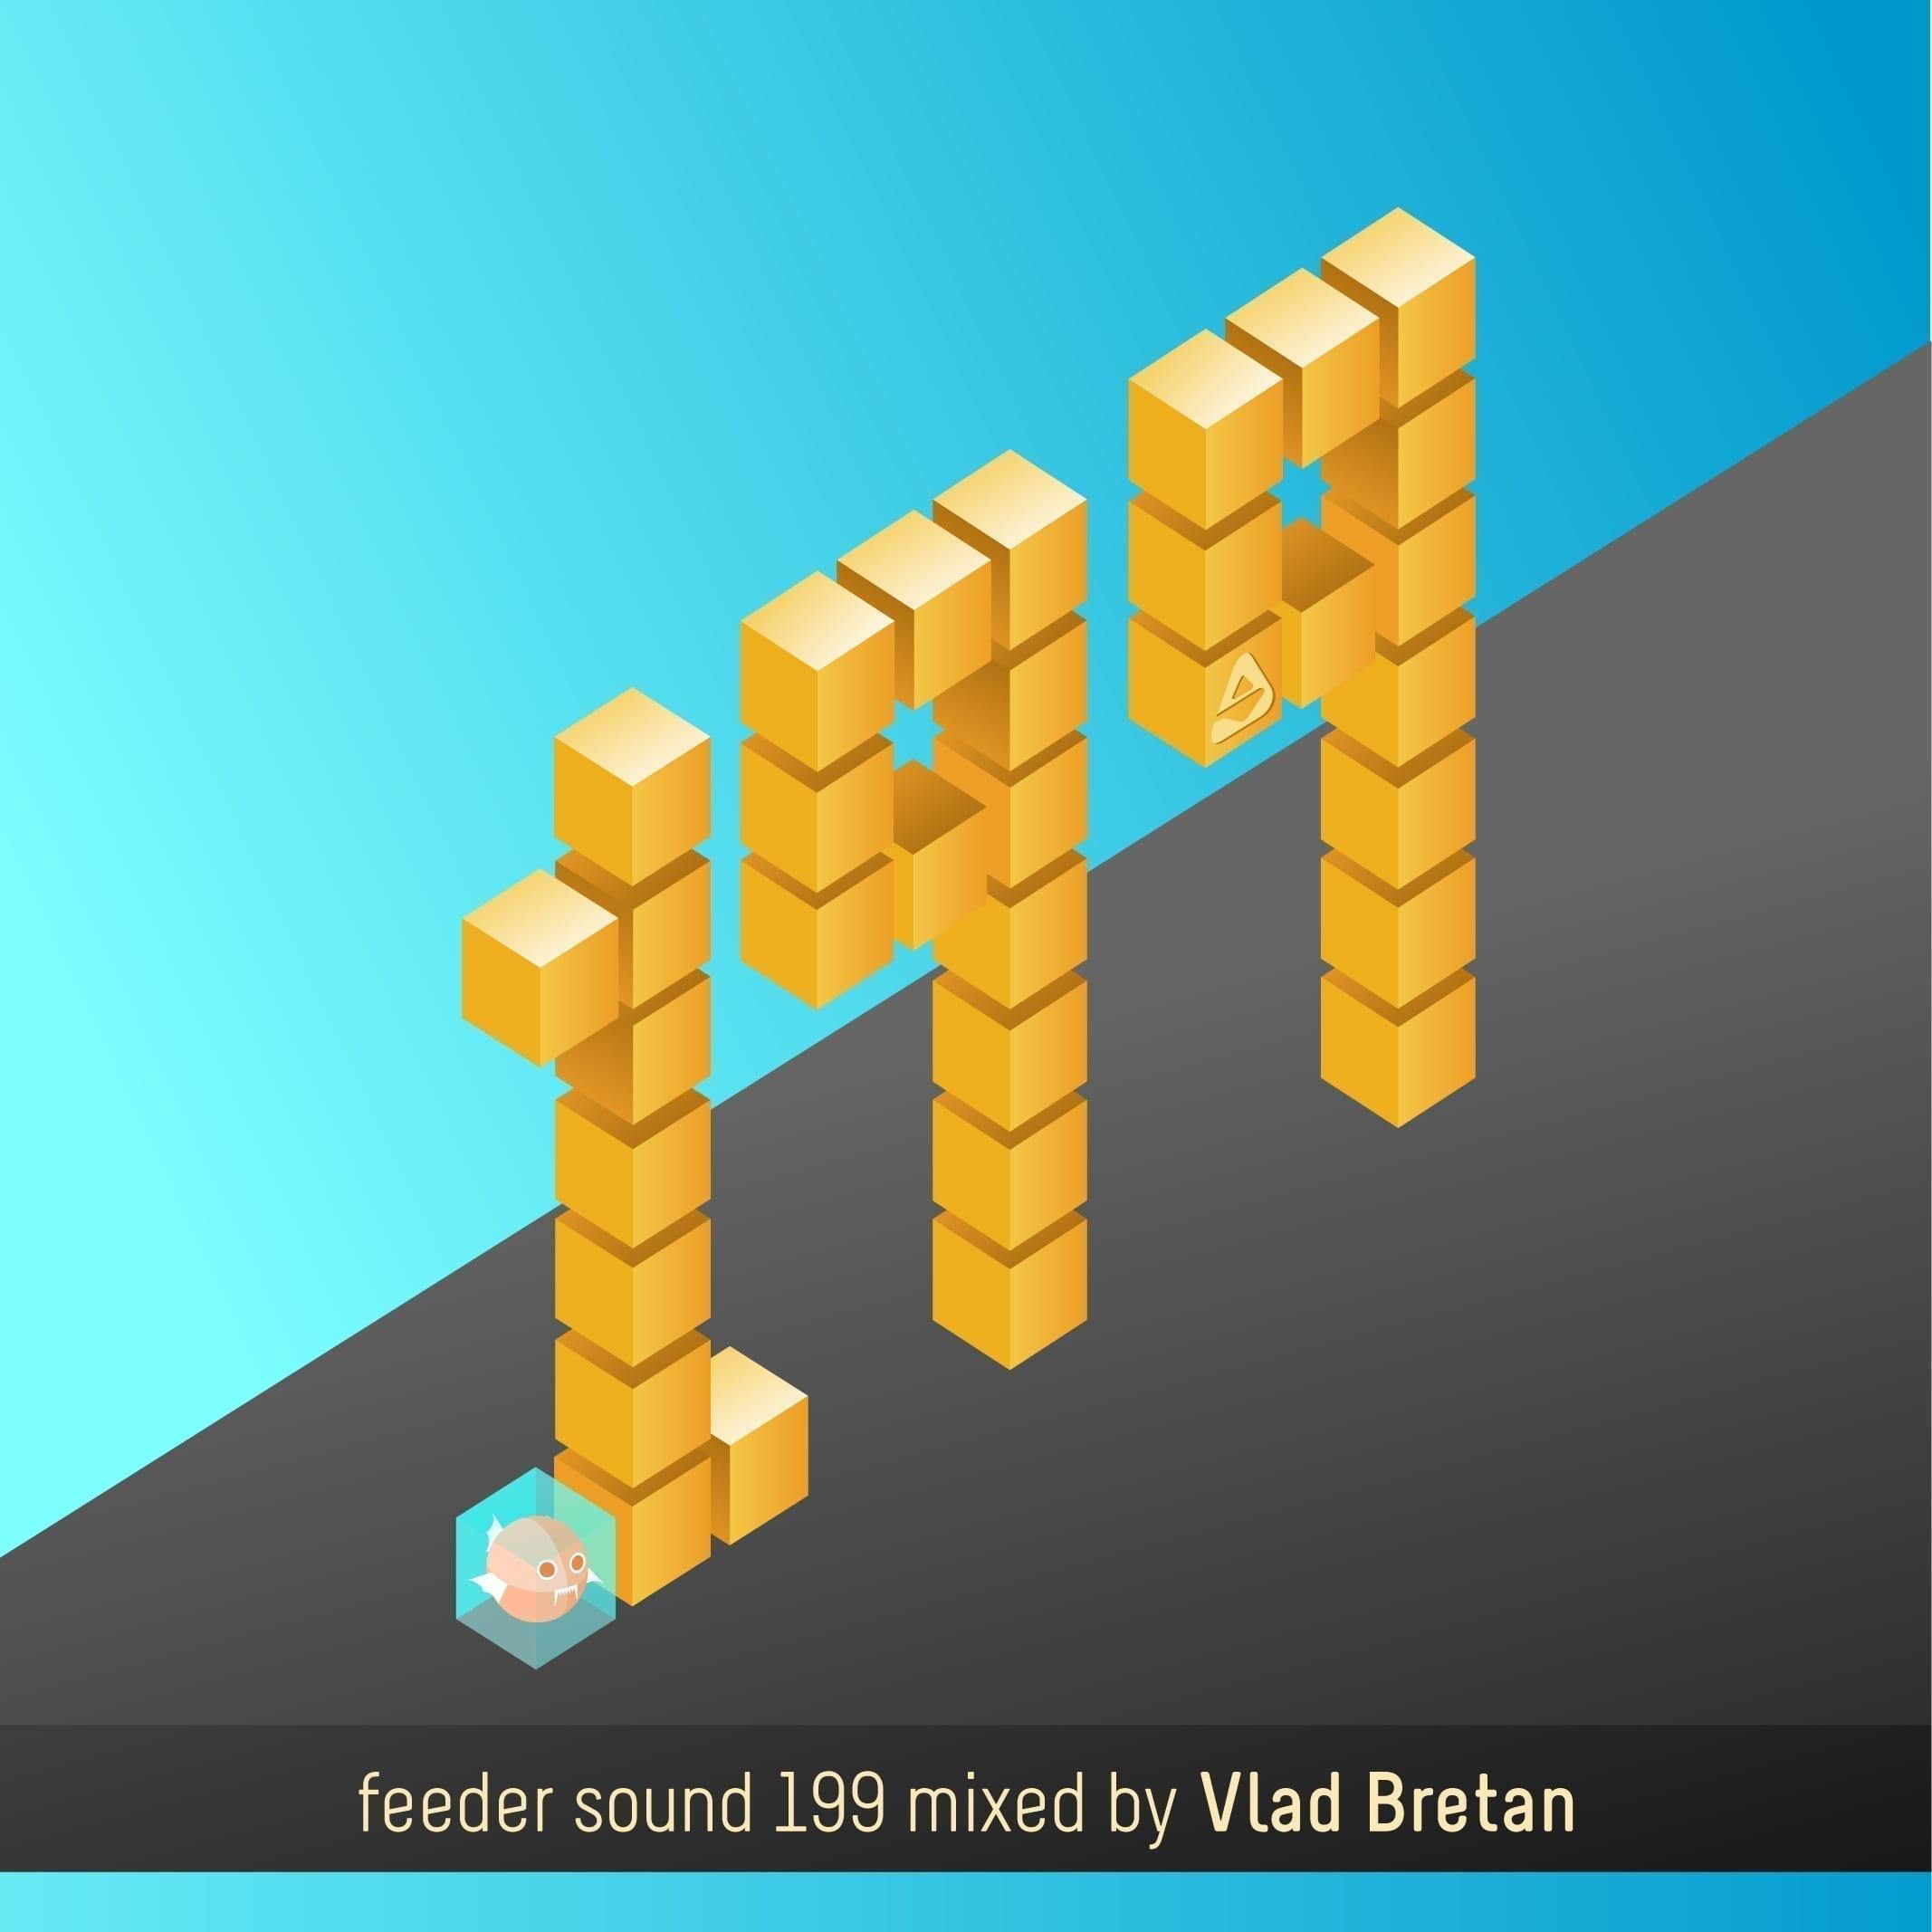 feeder sound 199 mixed by Vlad Bretan